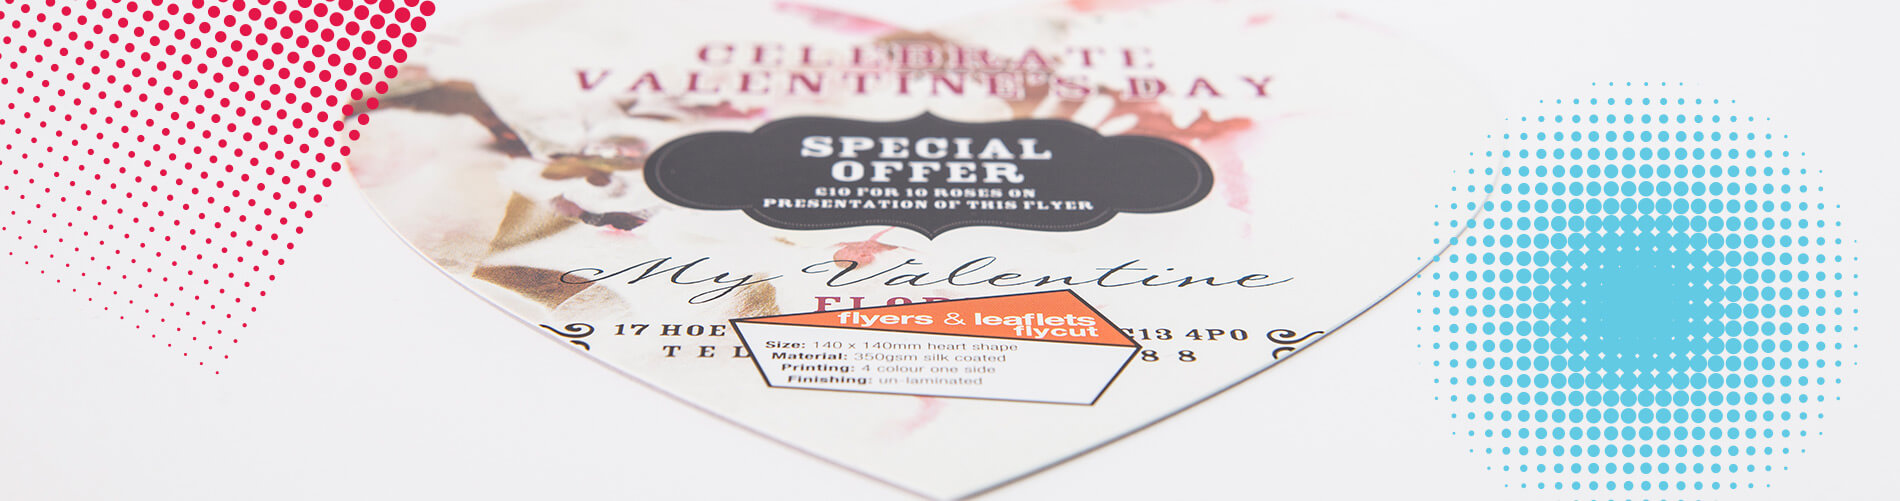 Flyer-printing-bromley-